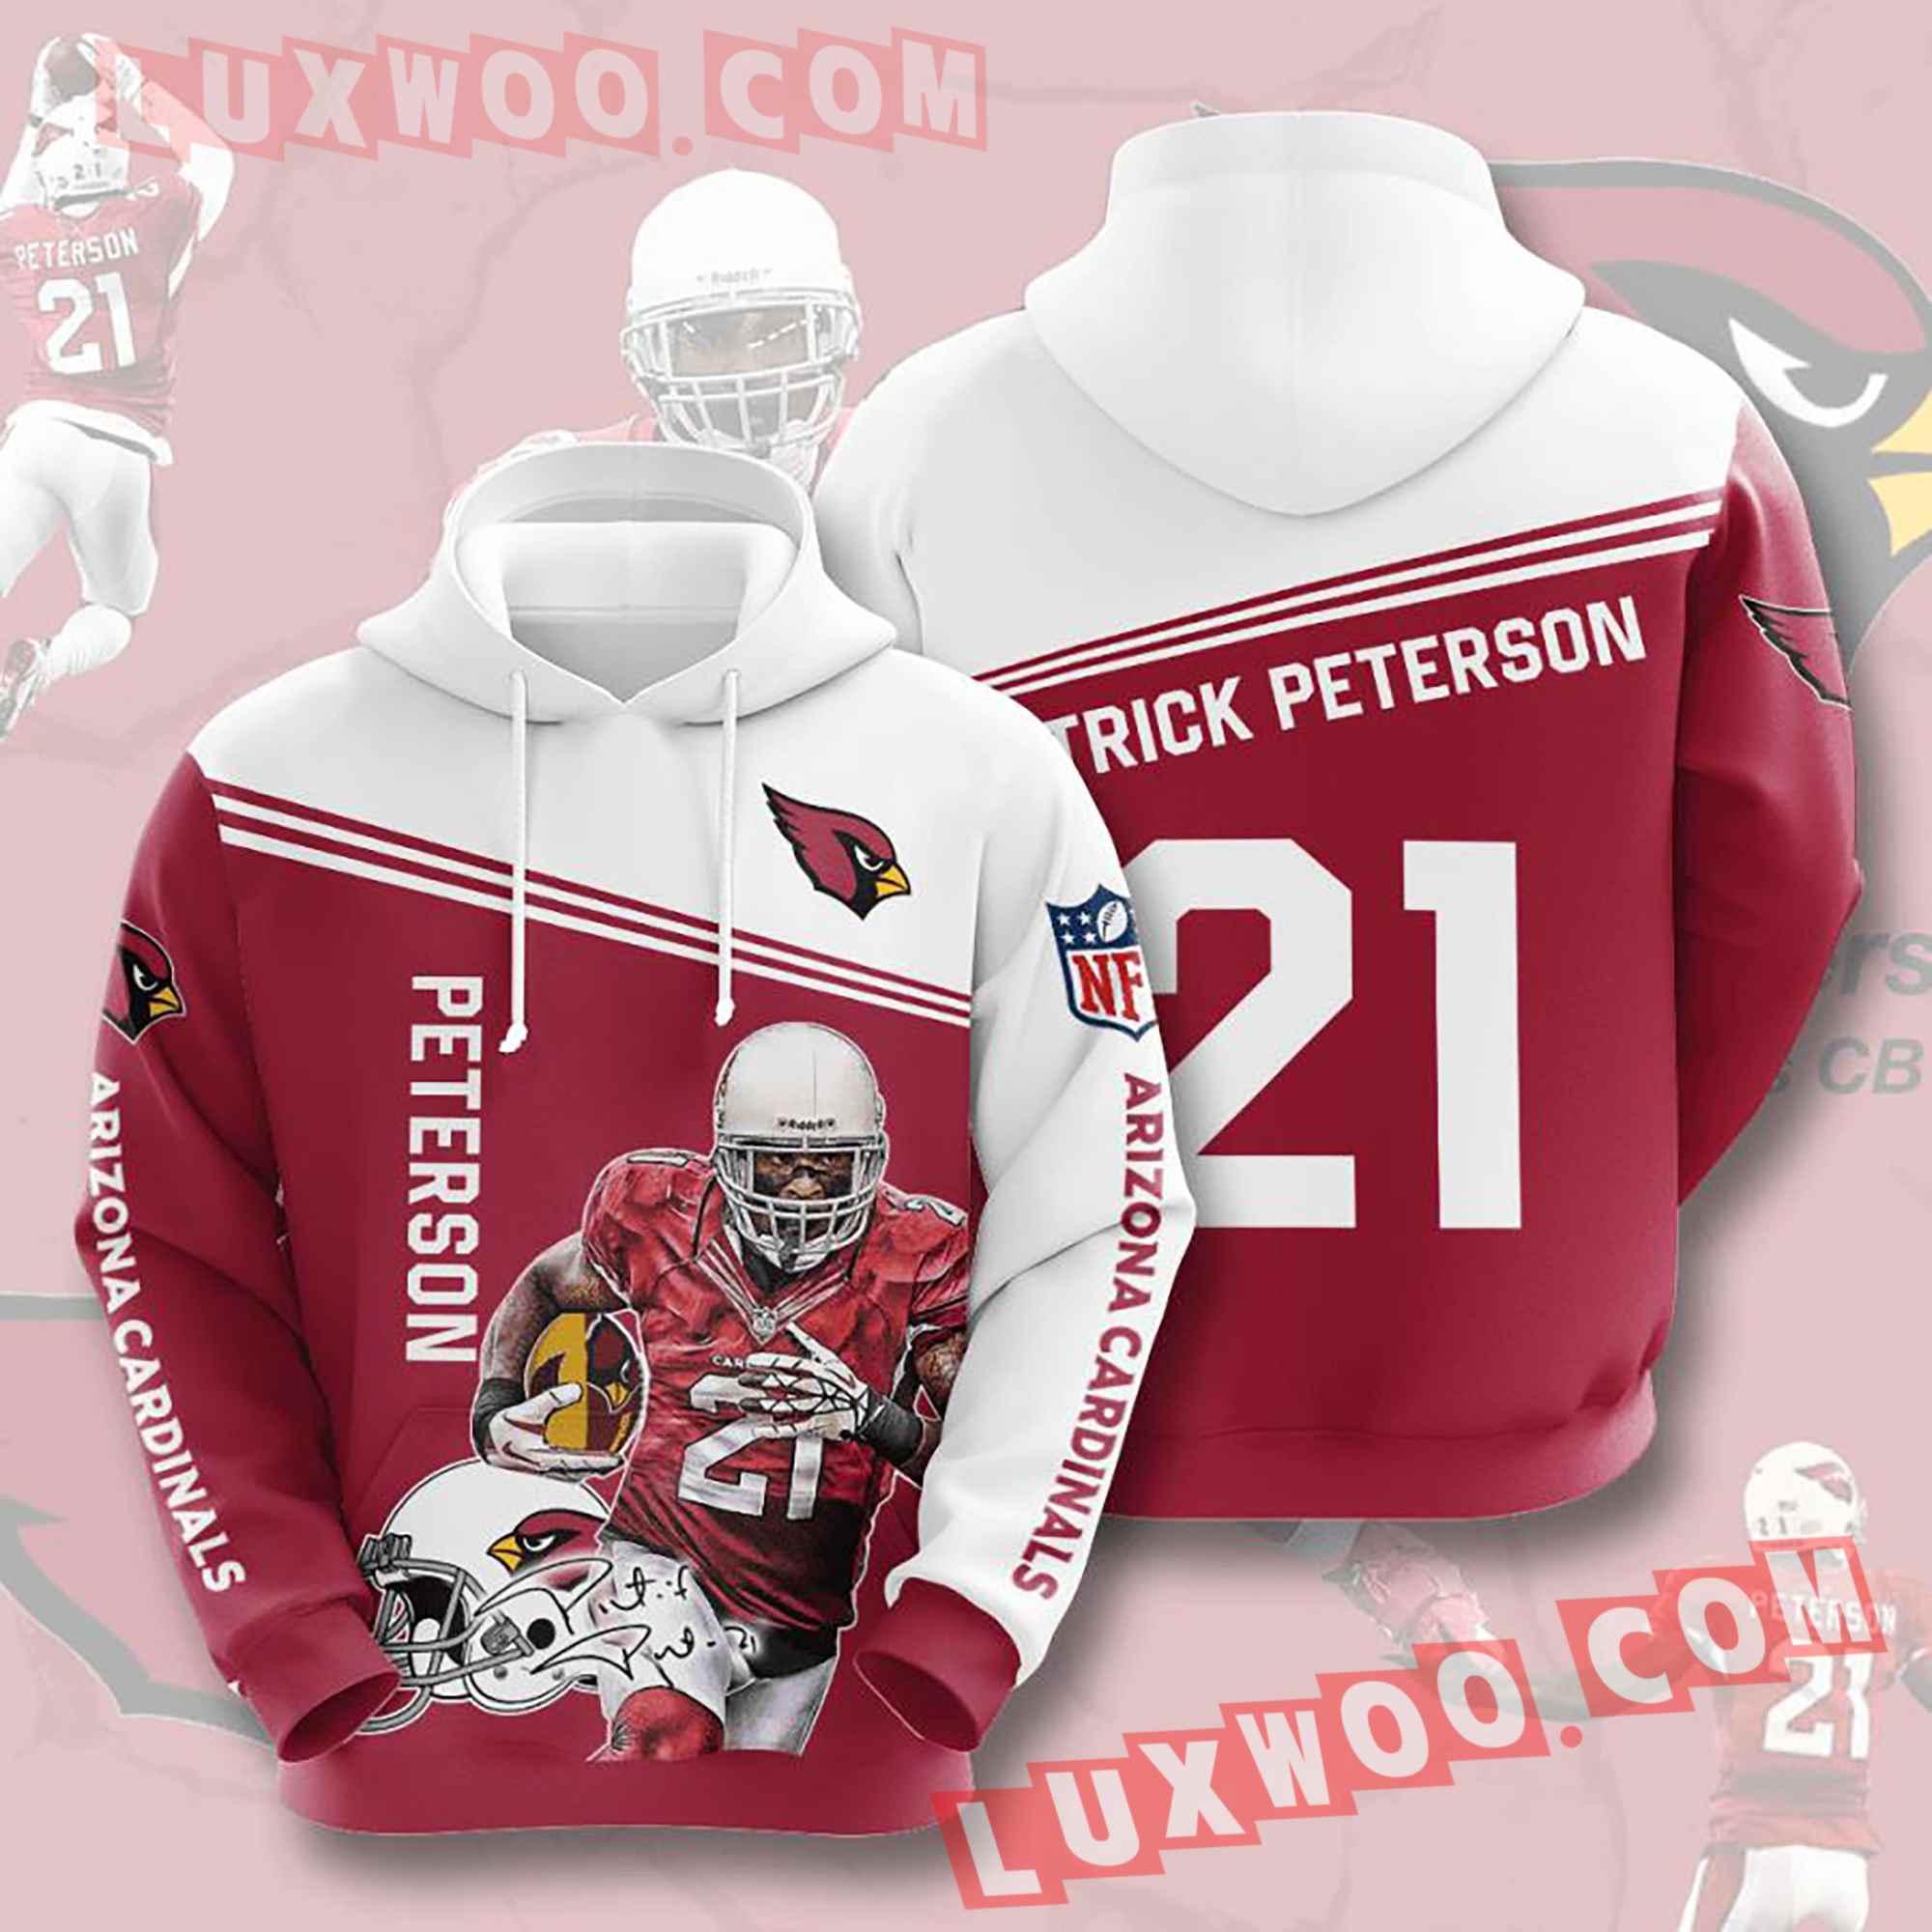 Nfl Arizona Cardinals Hoodies Custom All Over Print 3d Pullover Hoodie V16